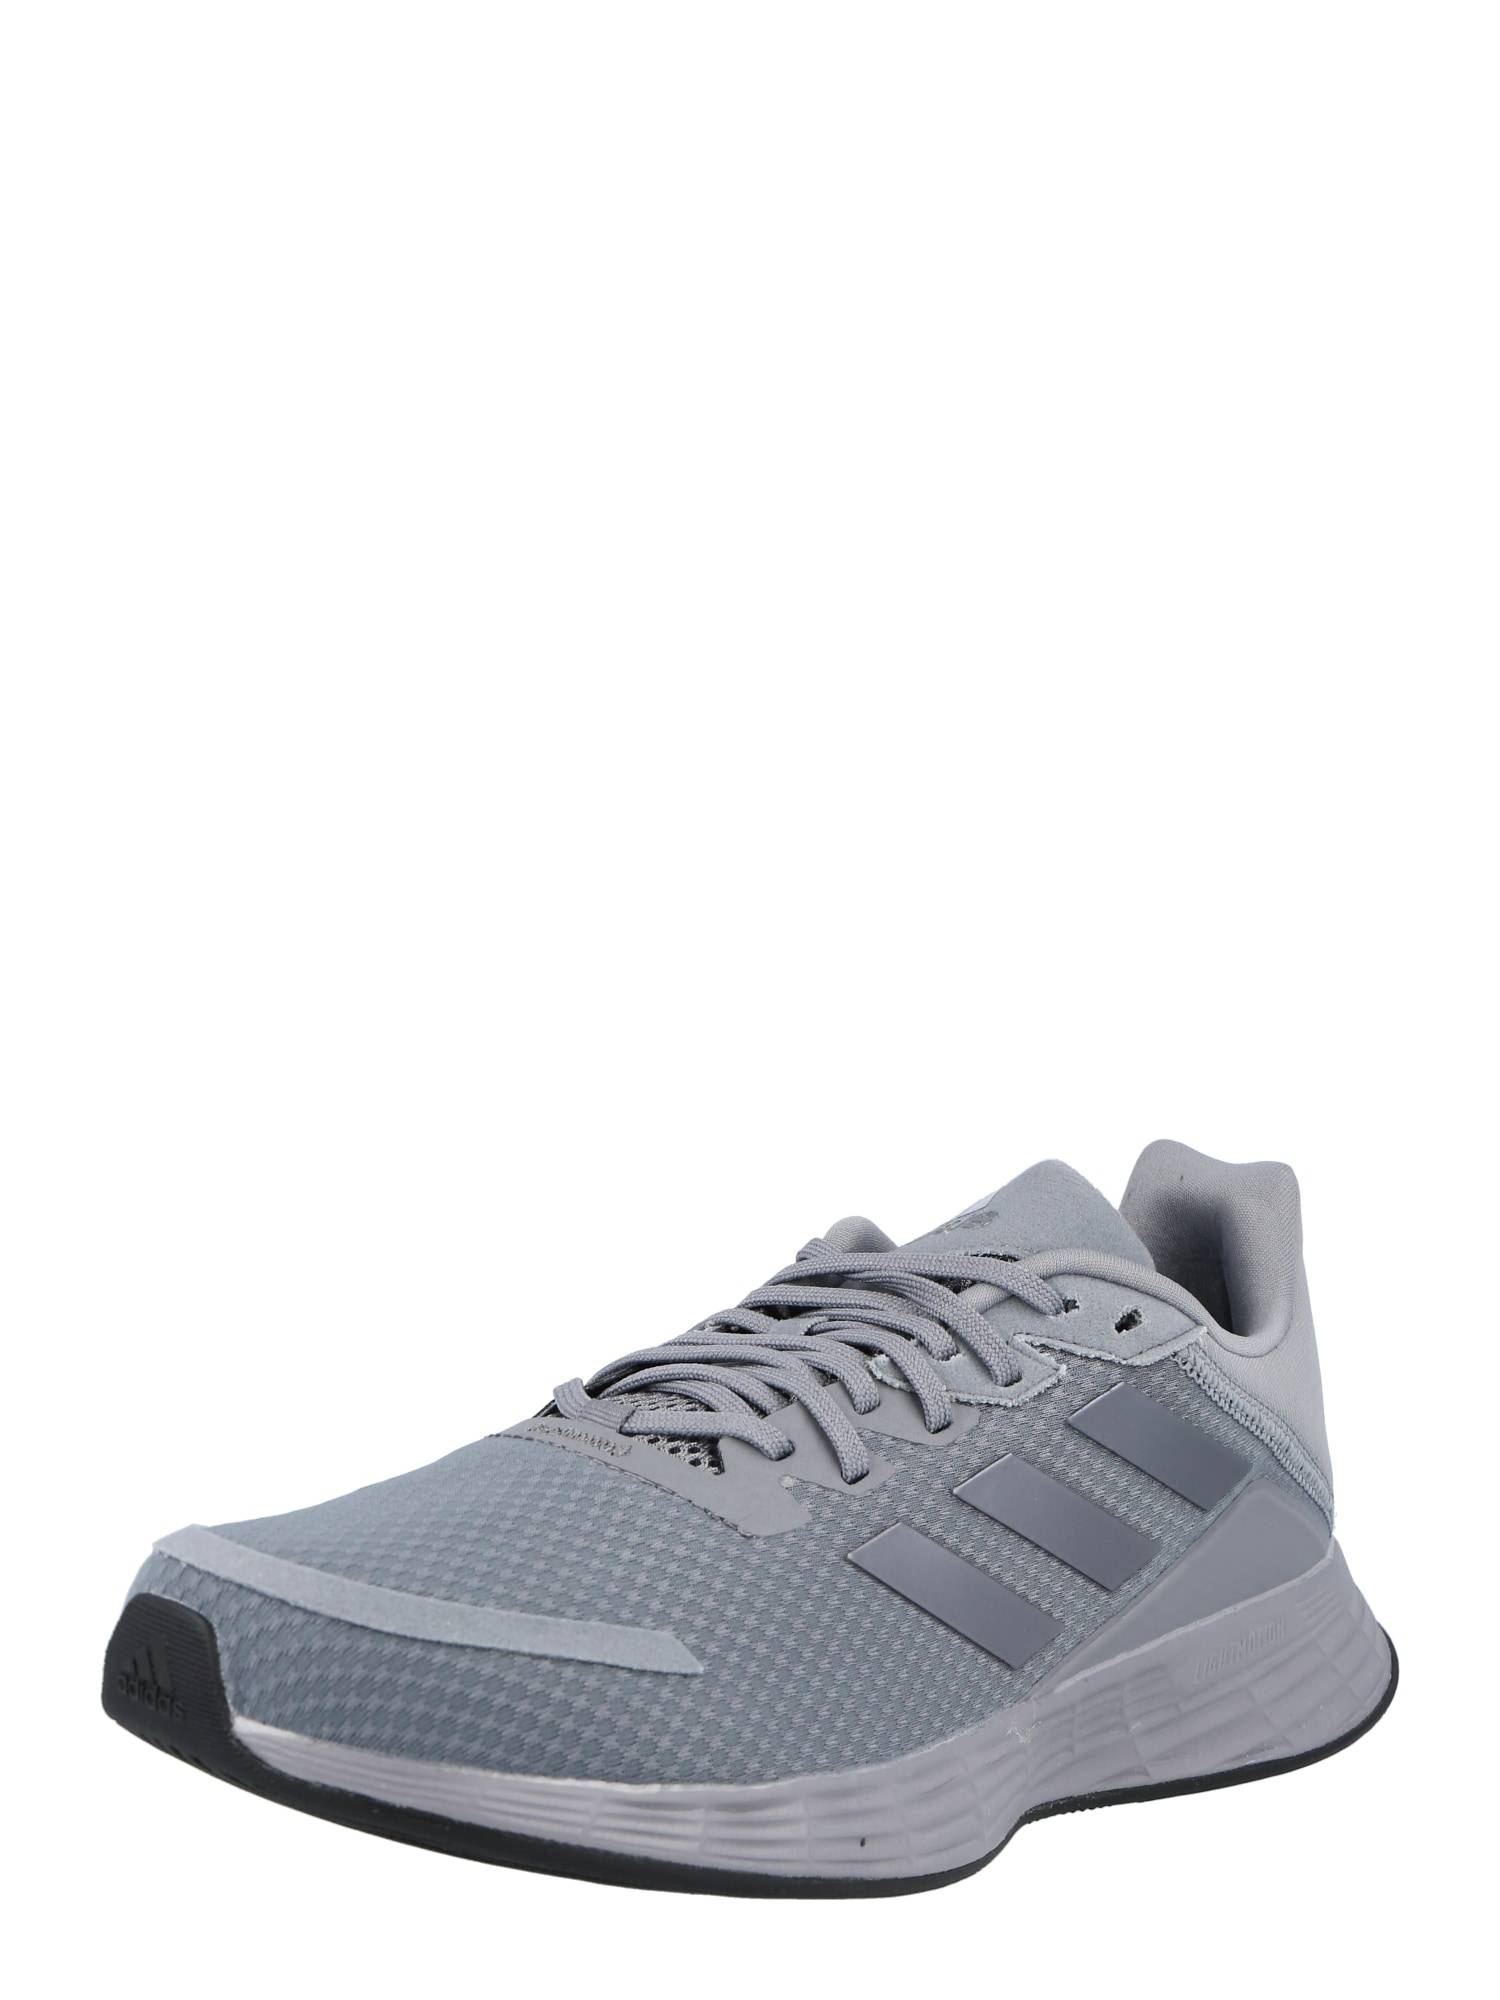 adidas performance scarpa da corsa 'duramo' grigio